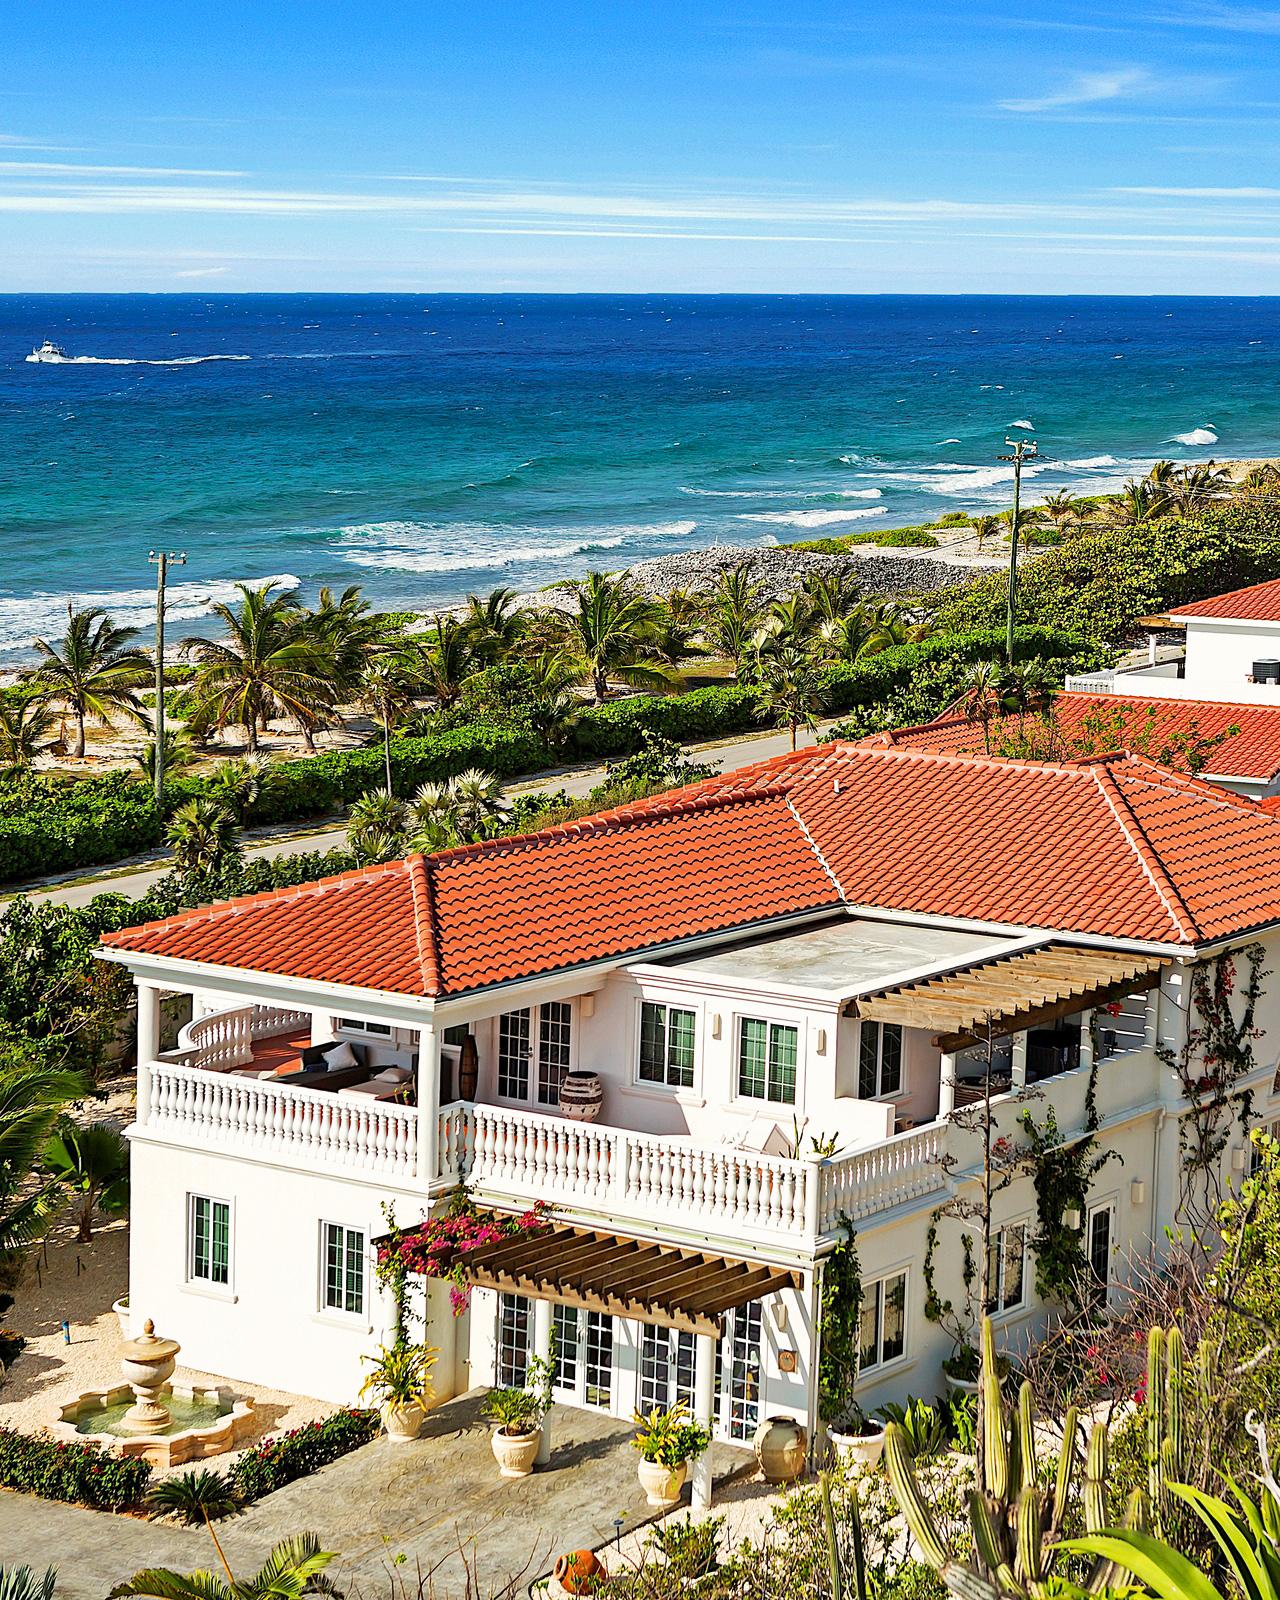 romantic caribbean destination cayman islands